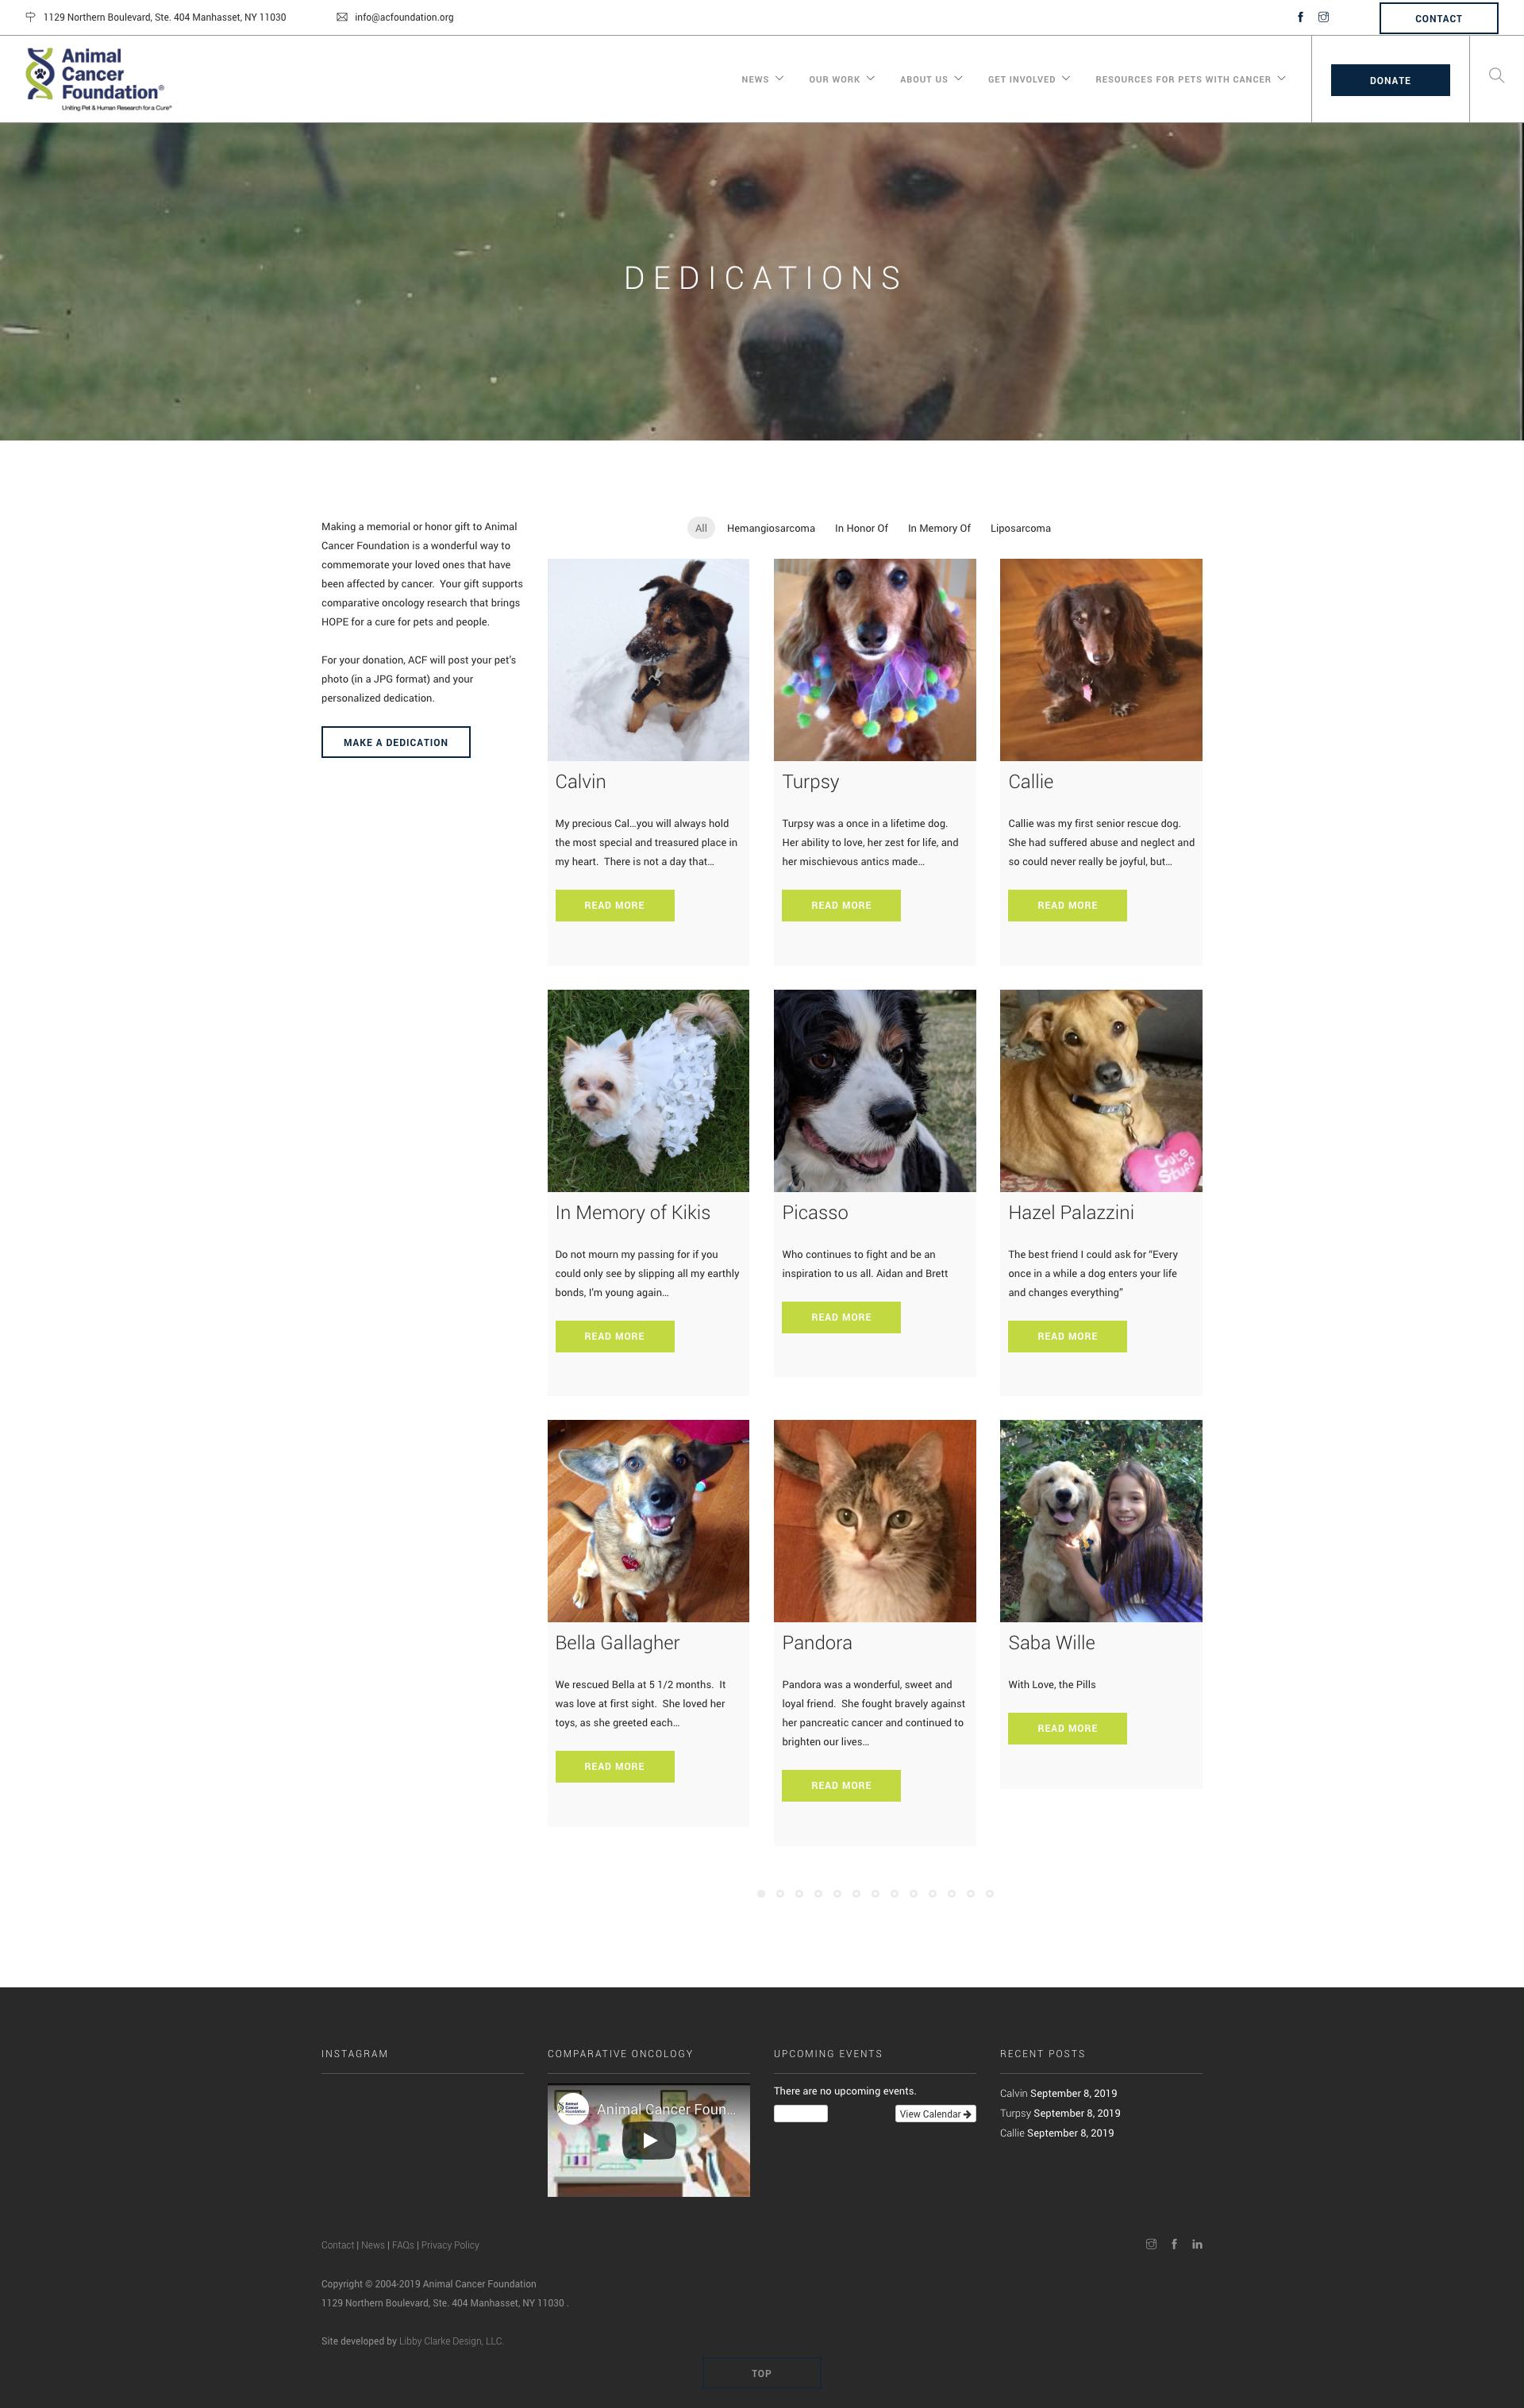 screencapture-acfoundation-org-dedications-2019-09-09-07_35_47.png